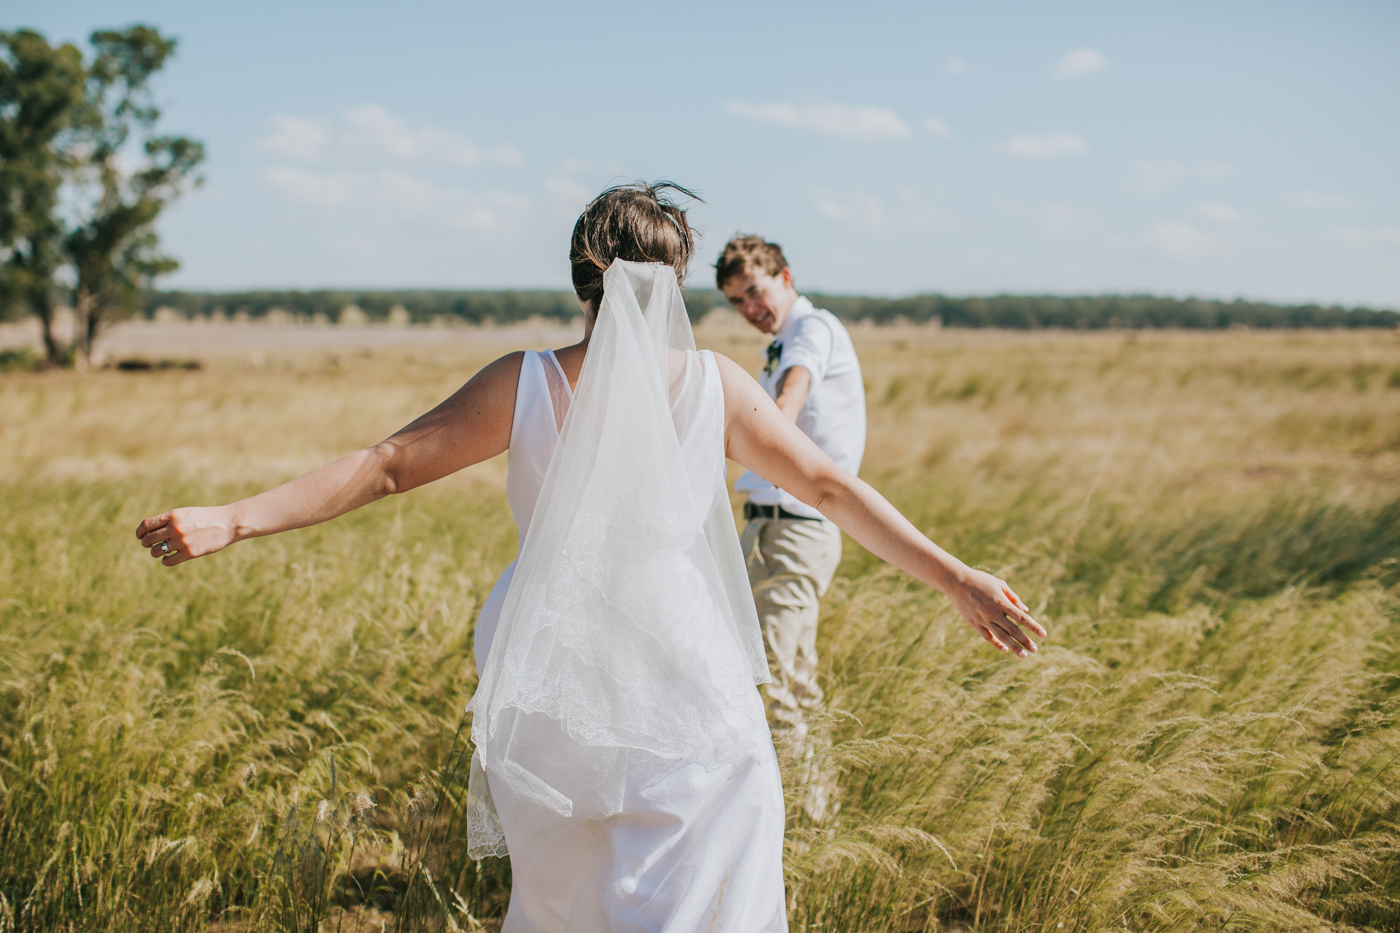 Nicolle & Jacob - Dubbo Wedding - Country Australia - Samantha Heather Photography-169.jpg